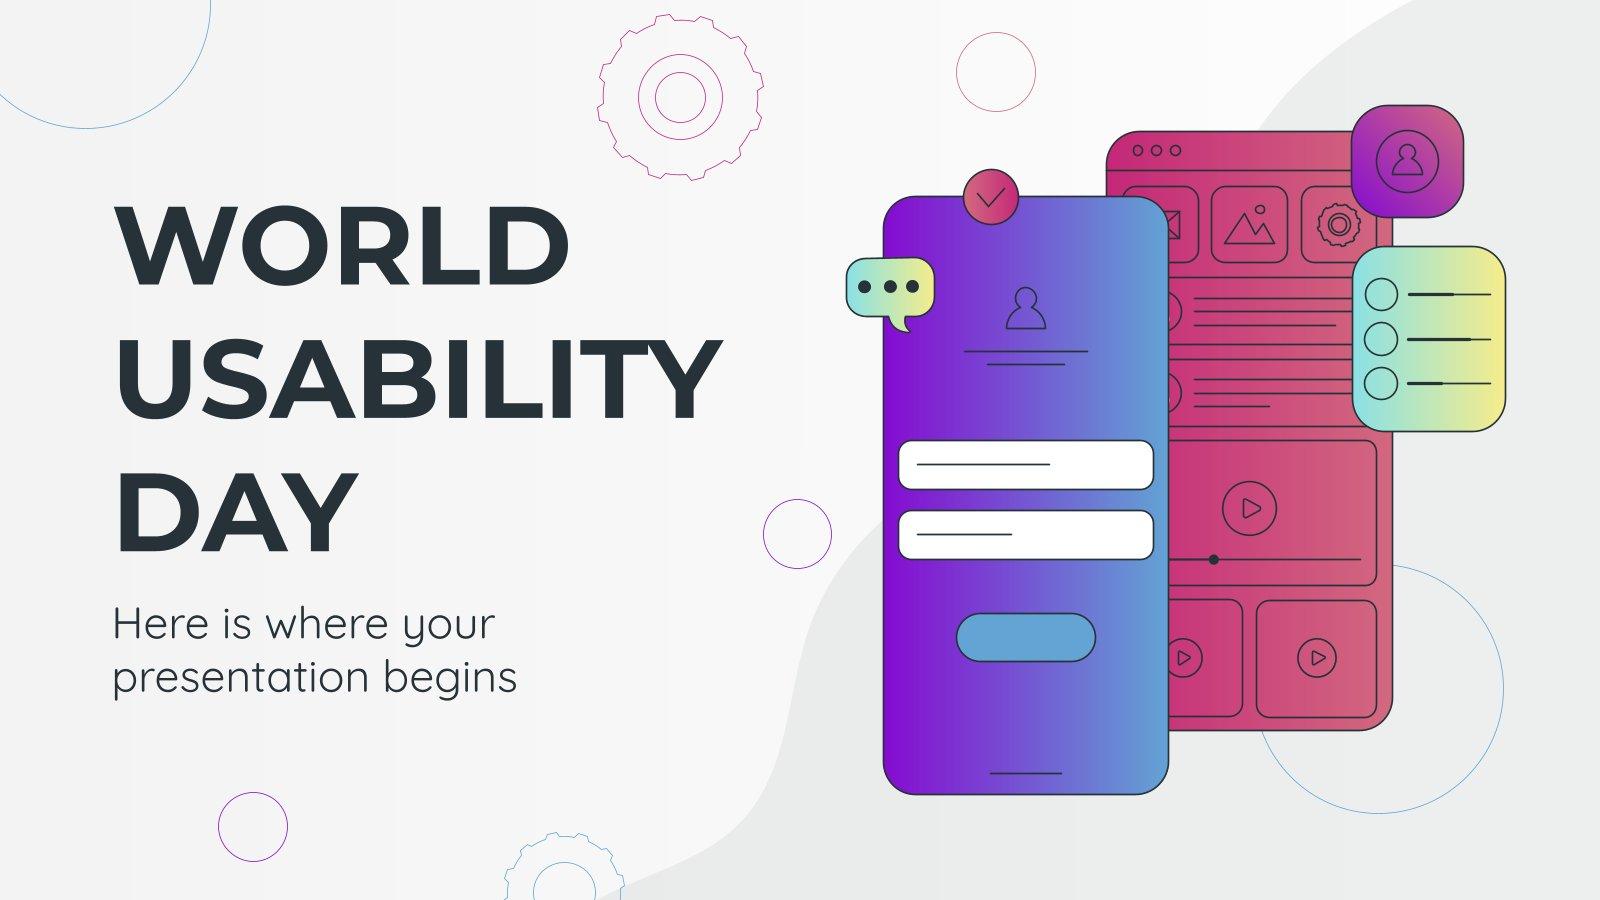 World Usability Day presentation template